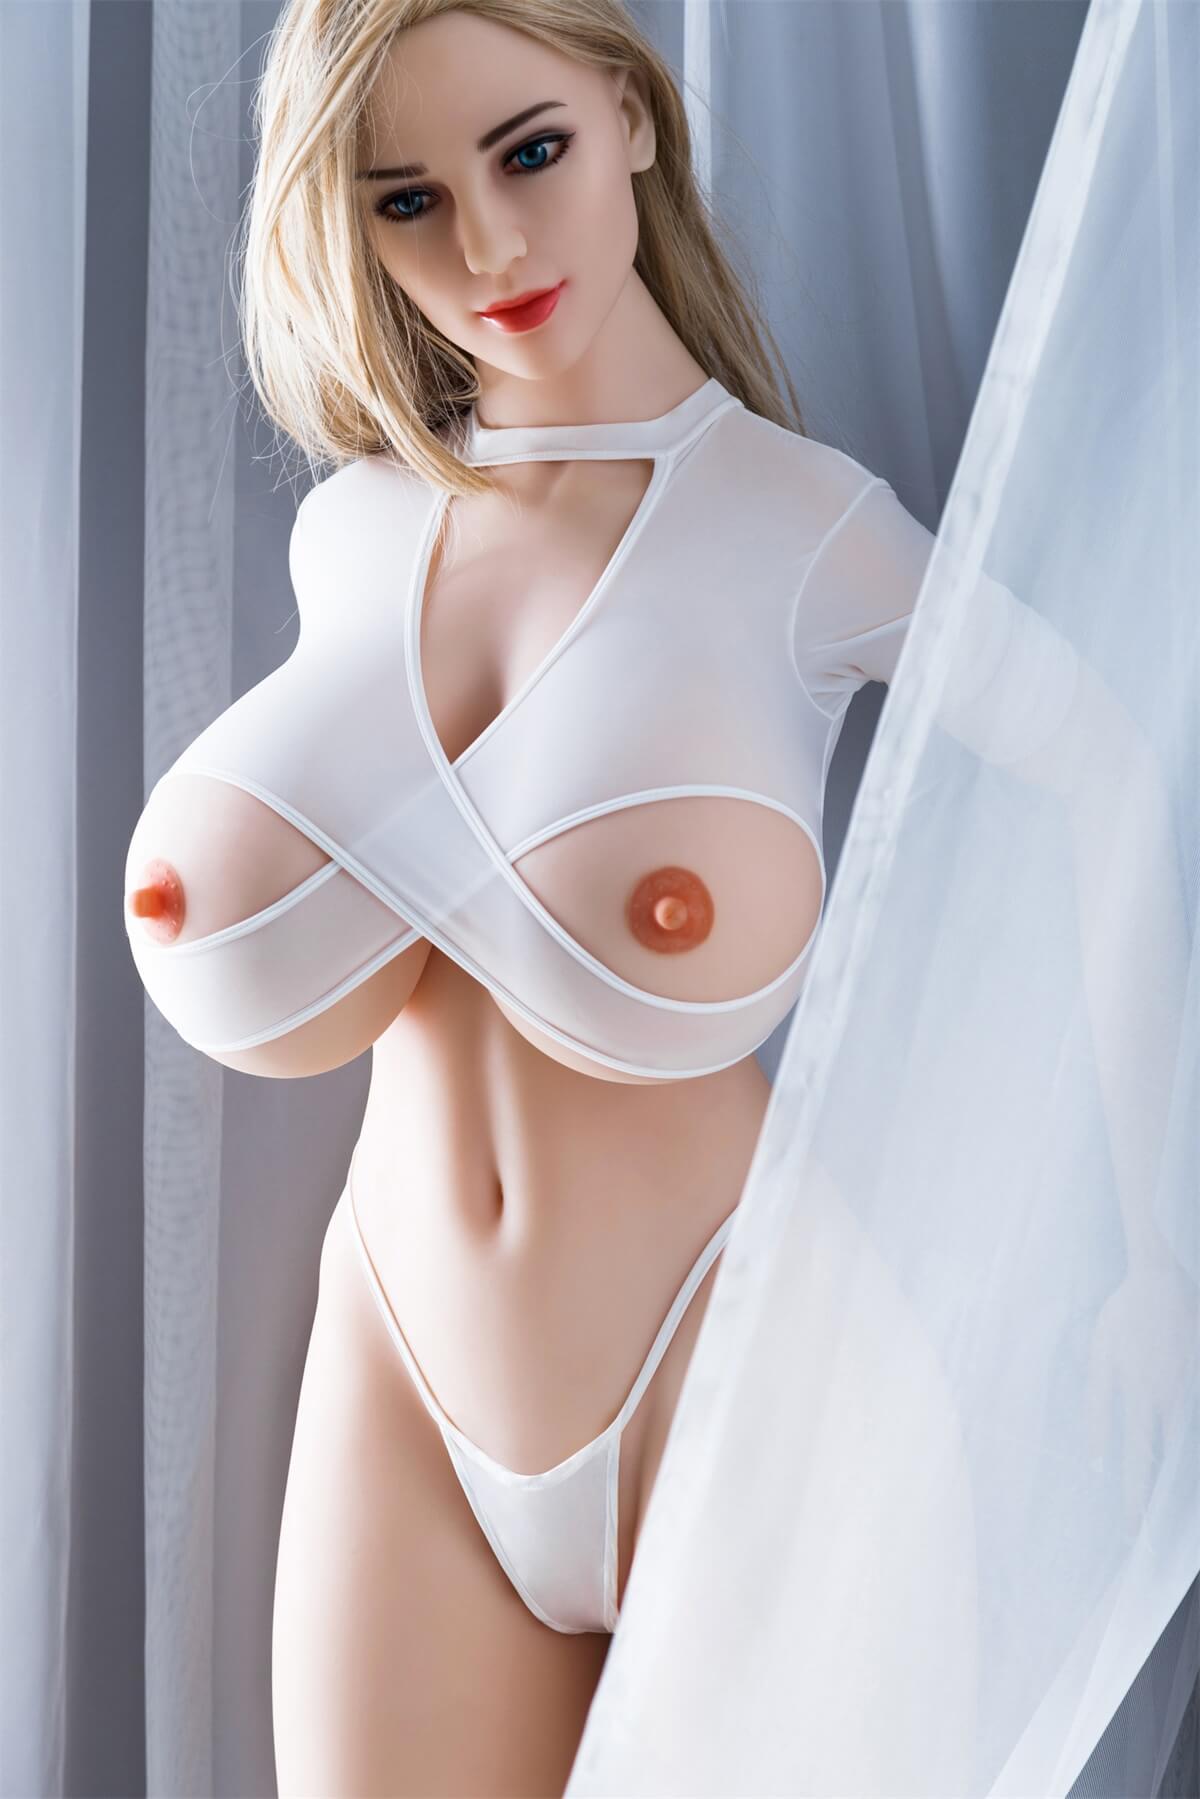 Asian Really Big Tits - Huge Boobs Sex Doll